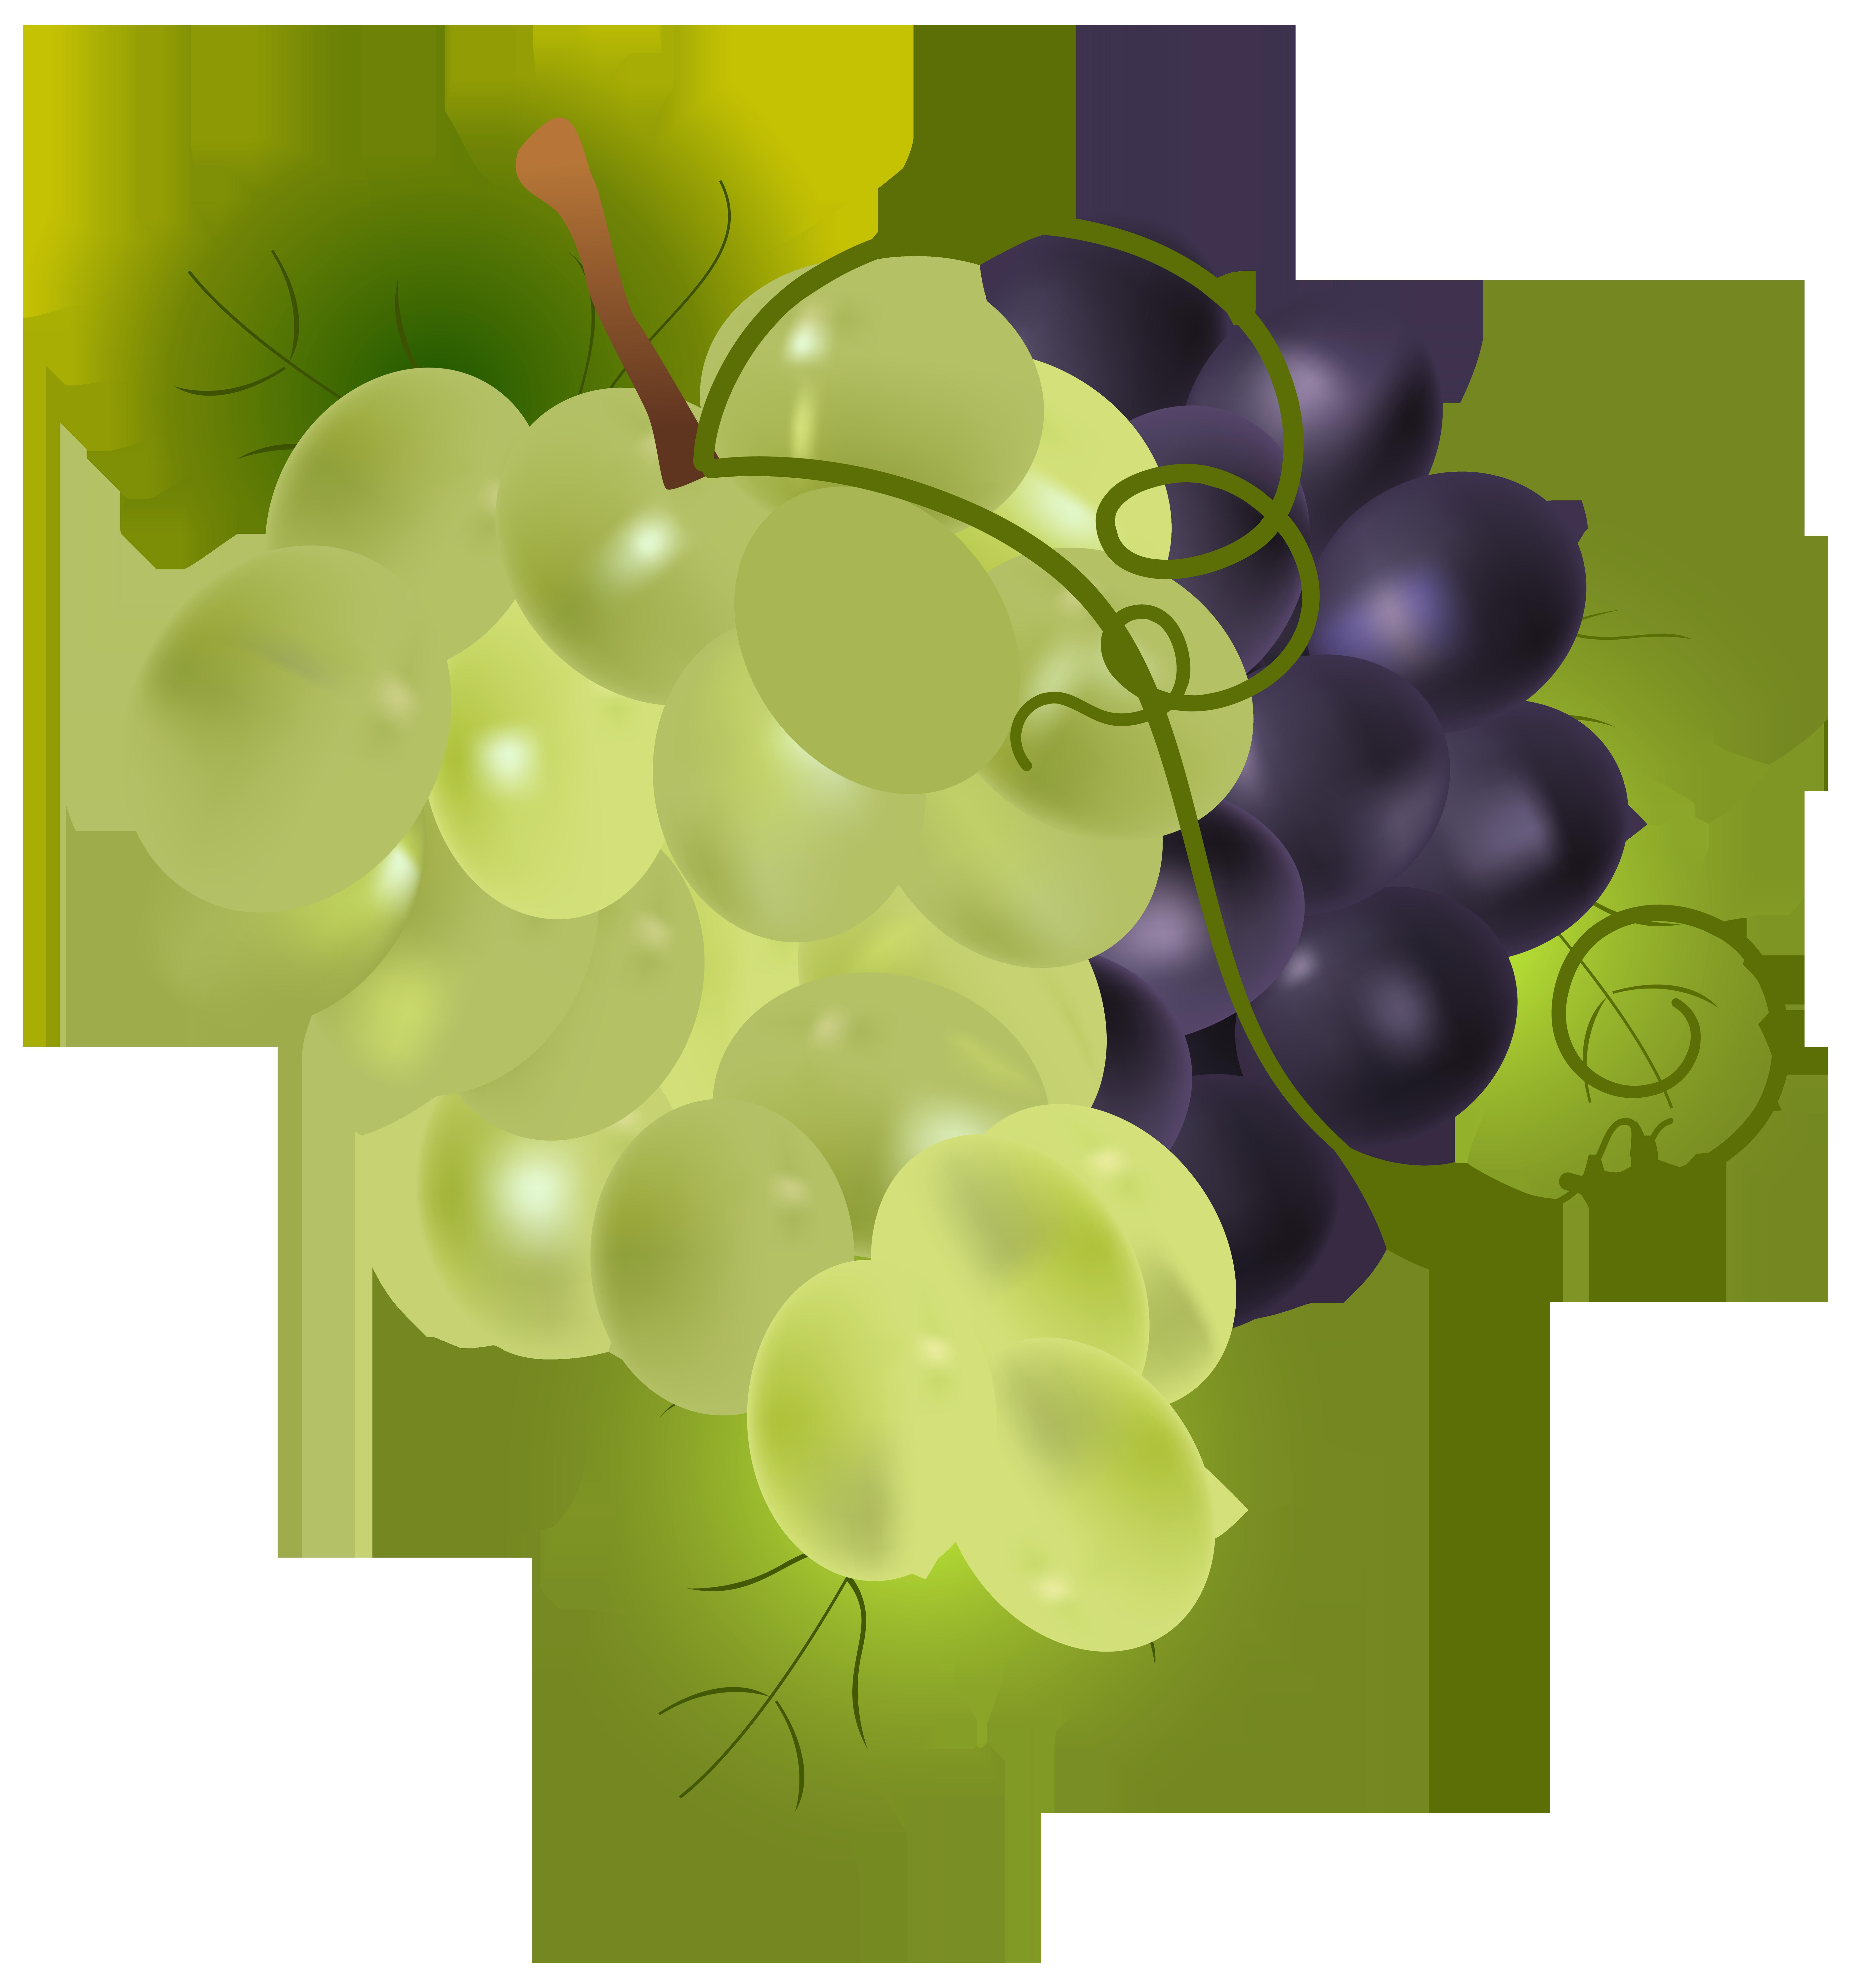 Grape clipart illustration. Grapes png clip art